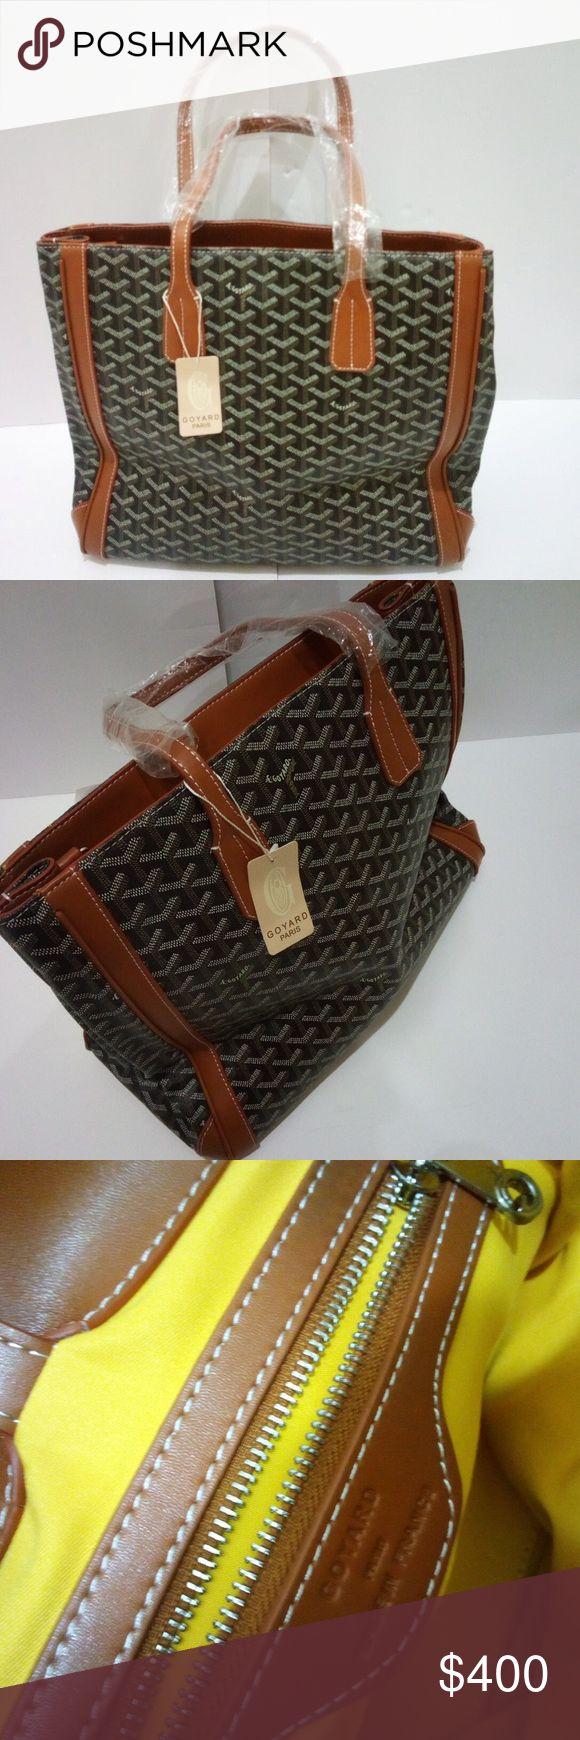 Goyard Purse Brand new with tags & dust bag. Goyard tote purse, really nice stylish bag! Bags Totes